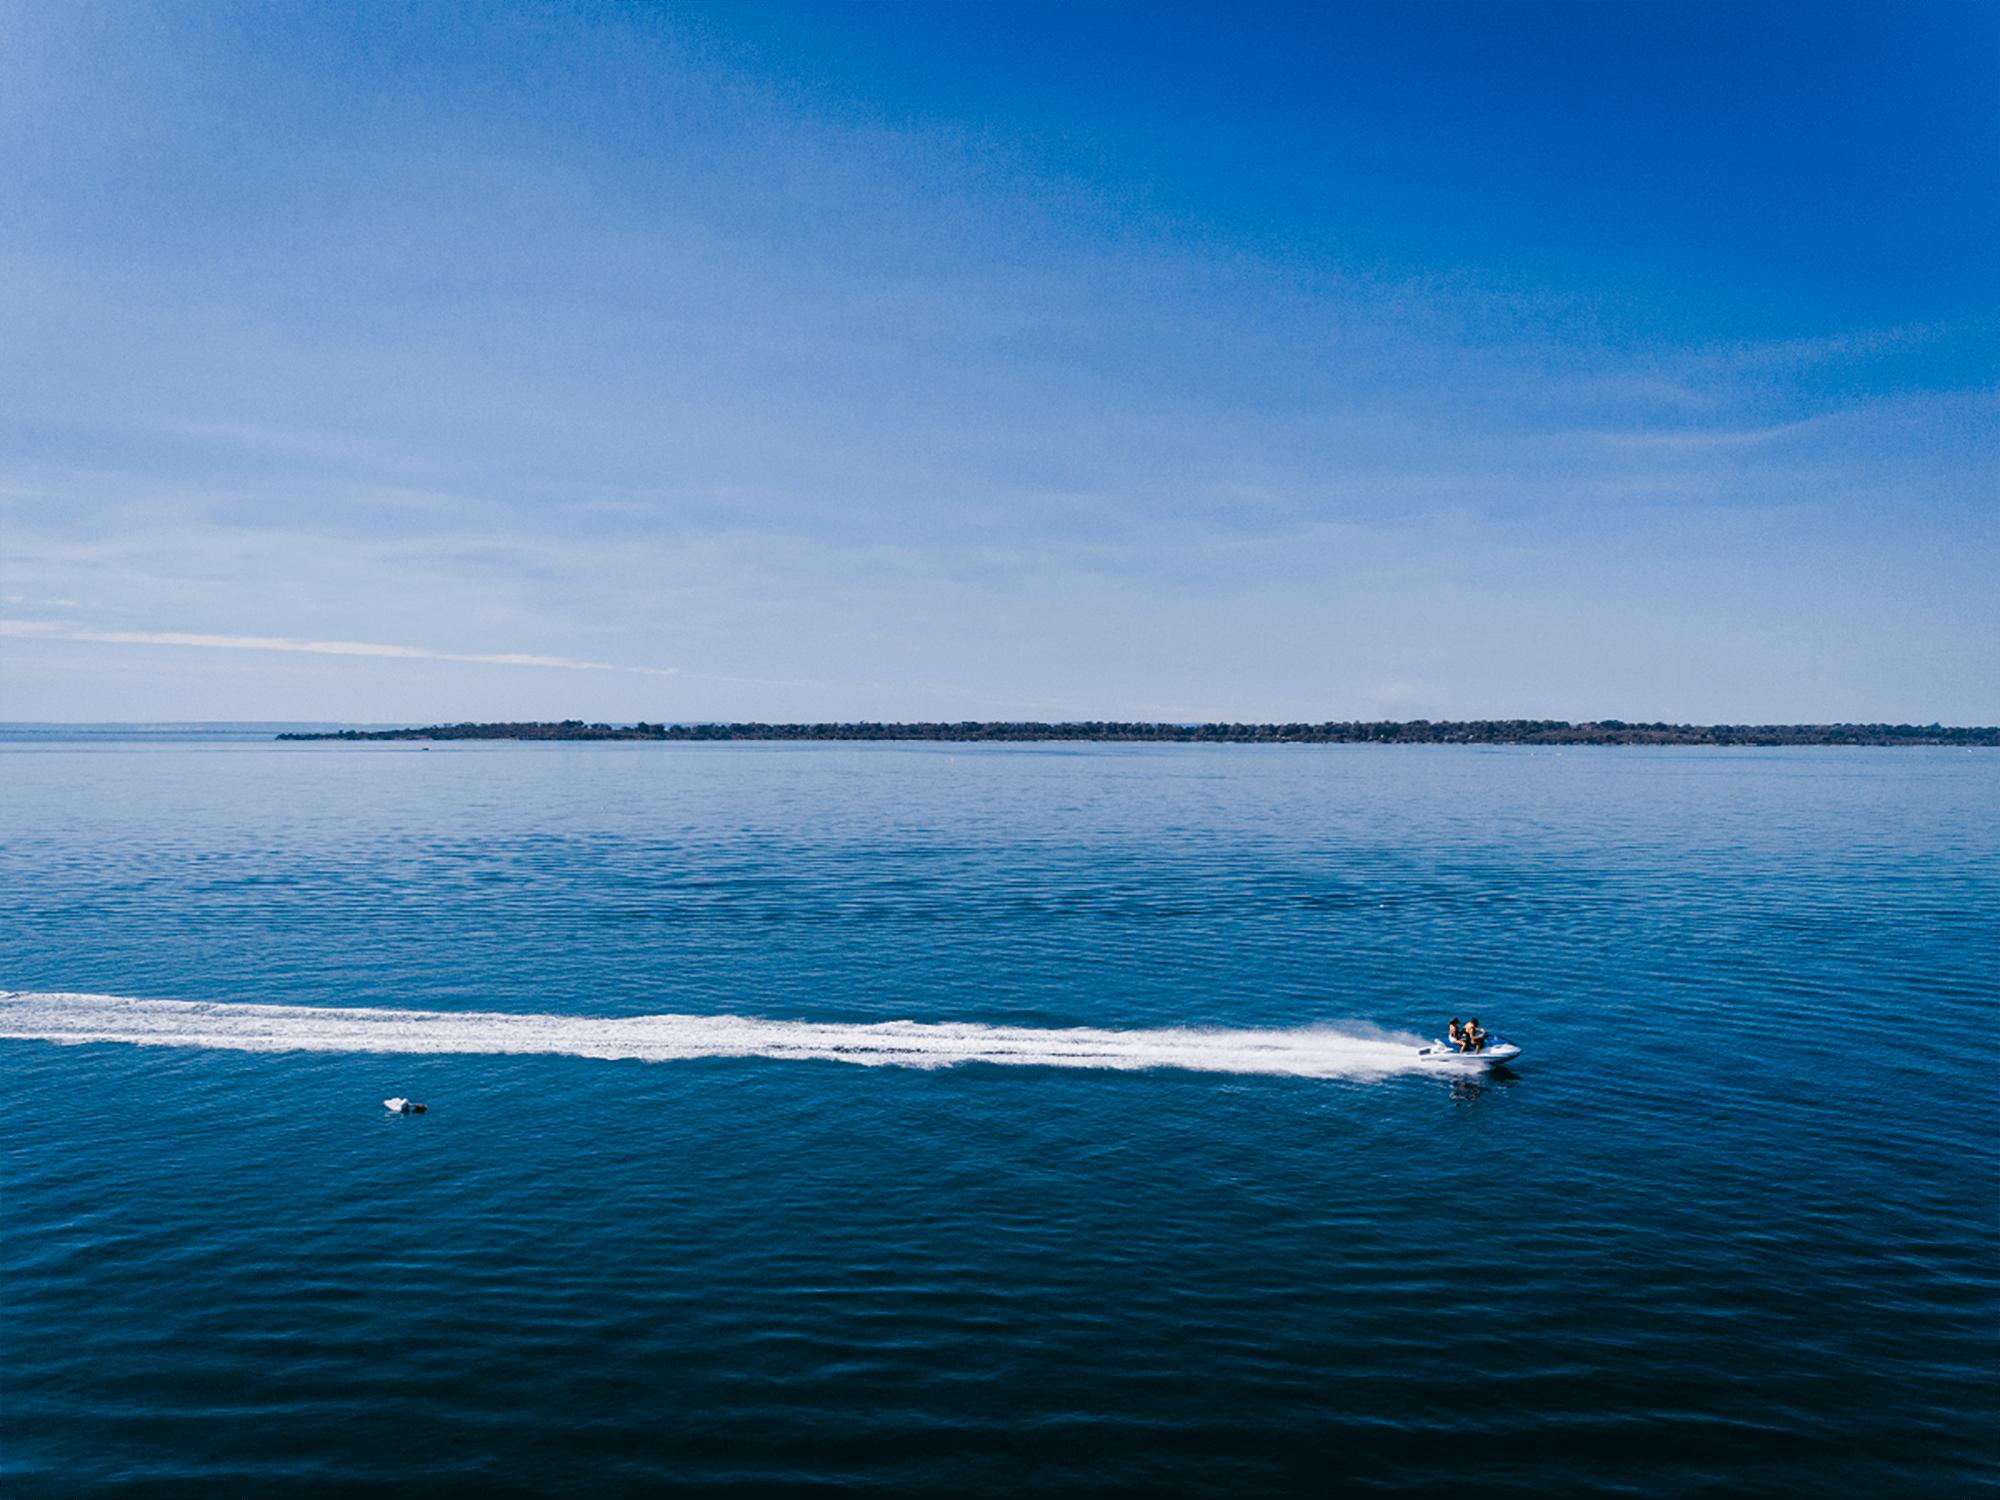 Jet Skiing on the estuary in Mandurah